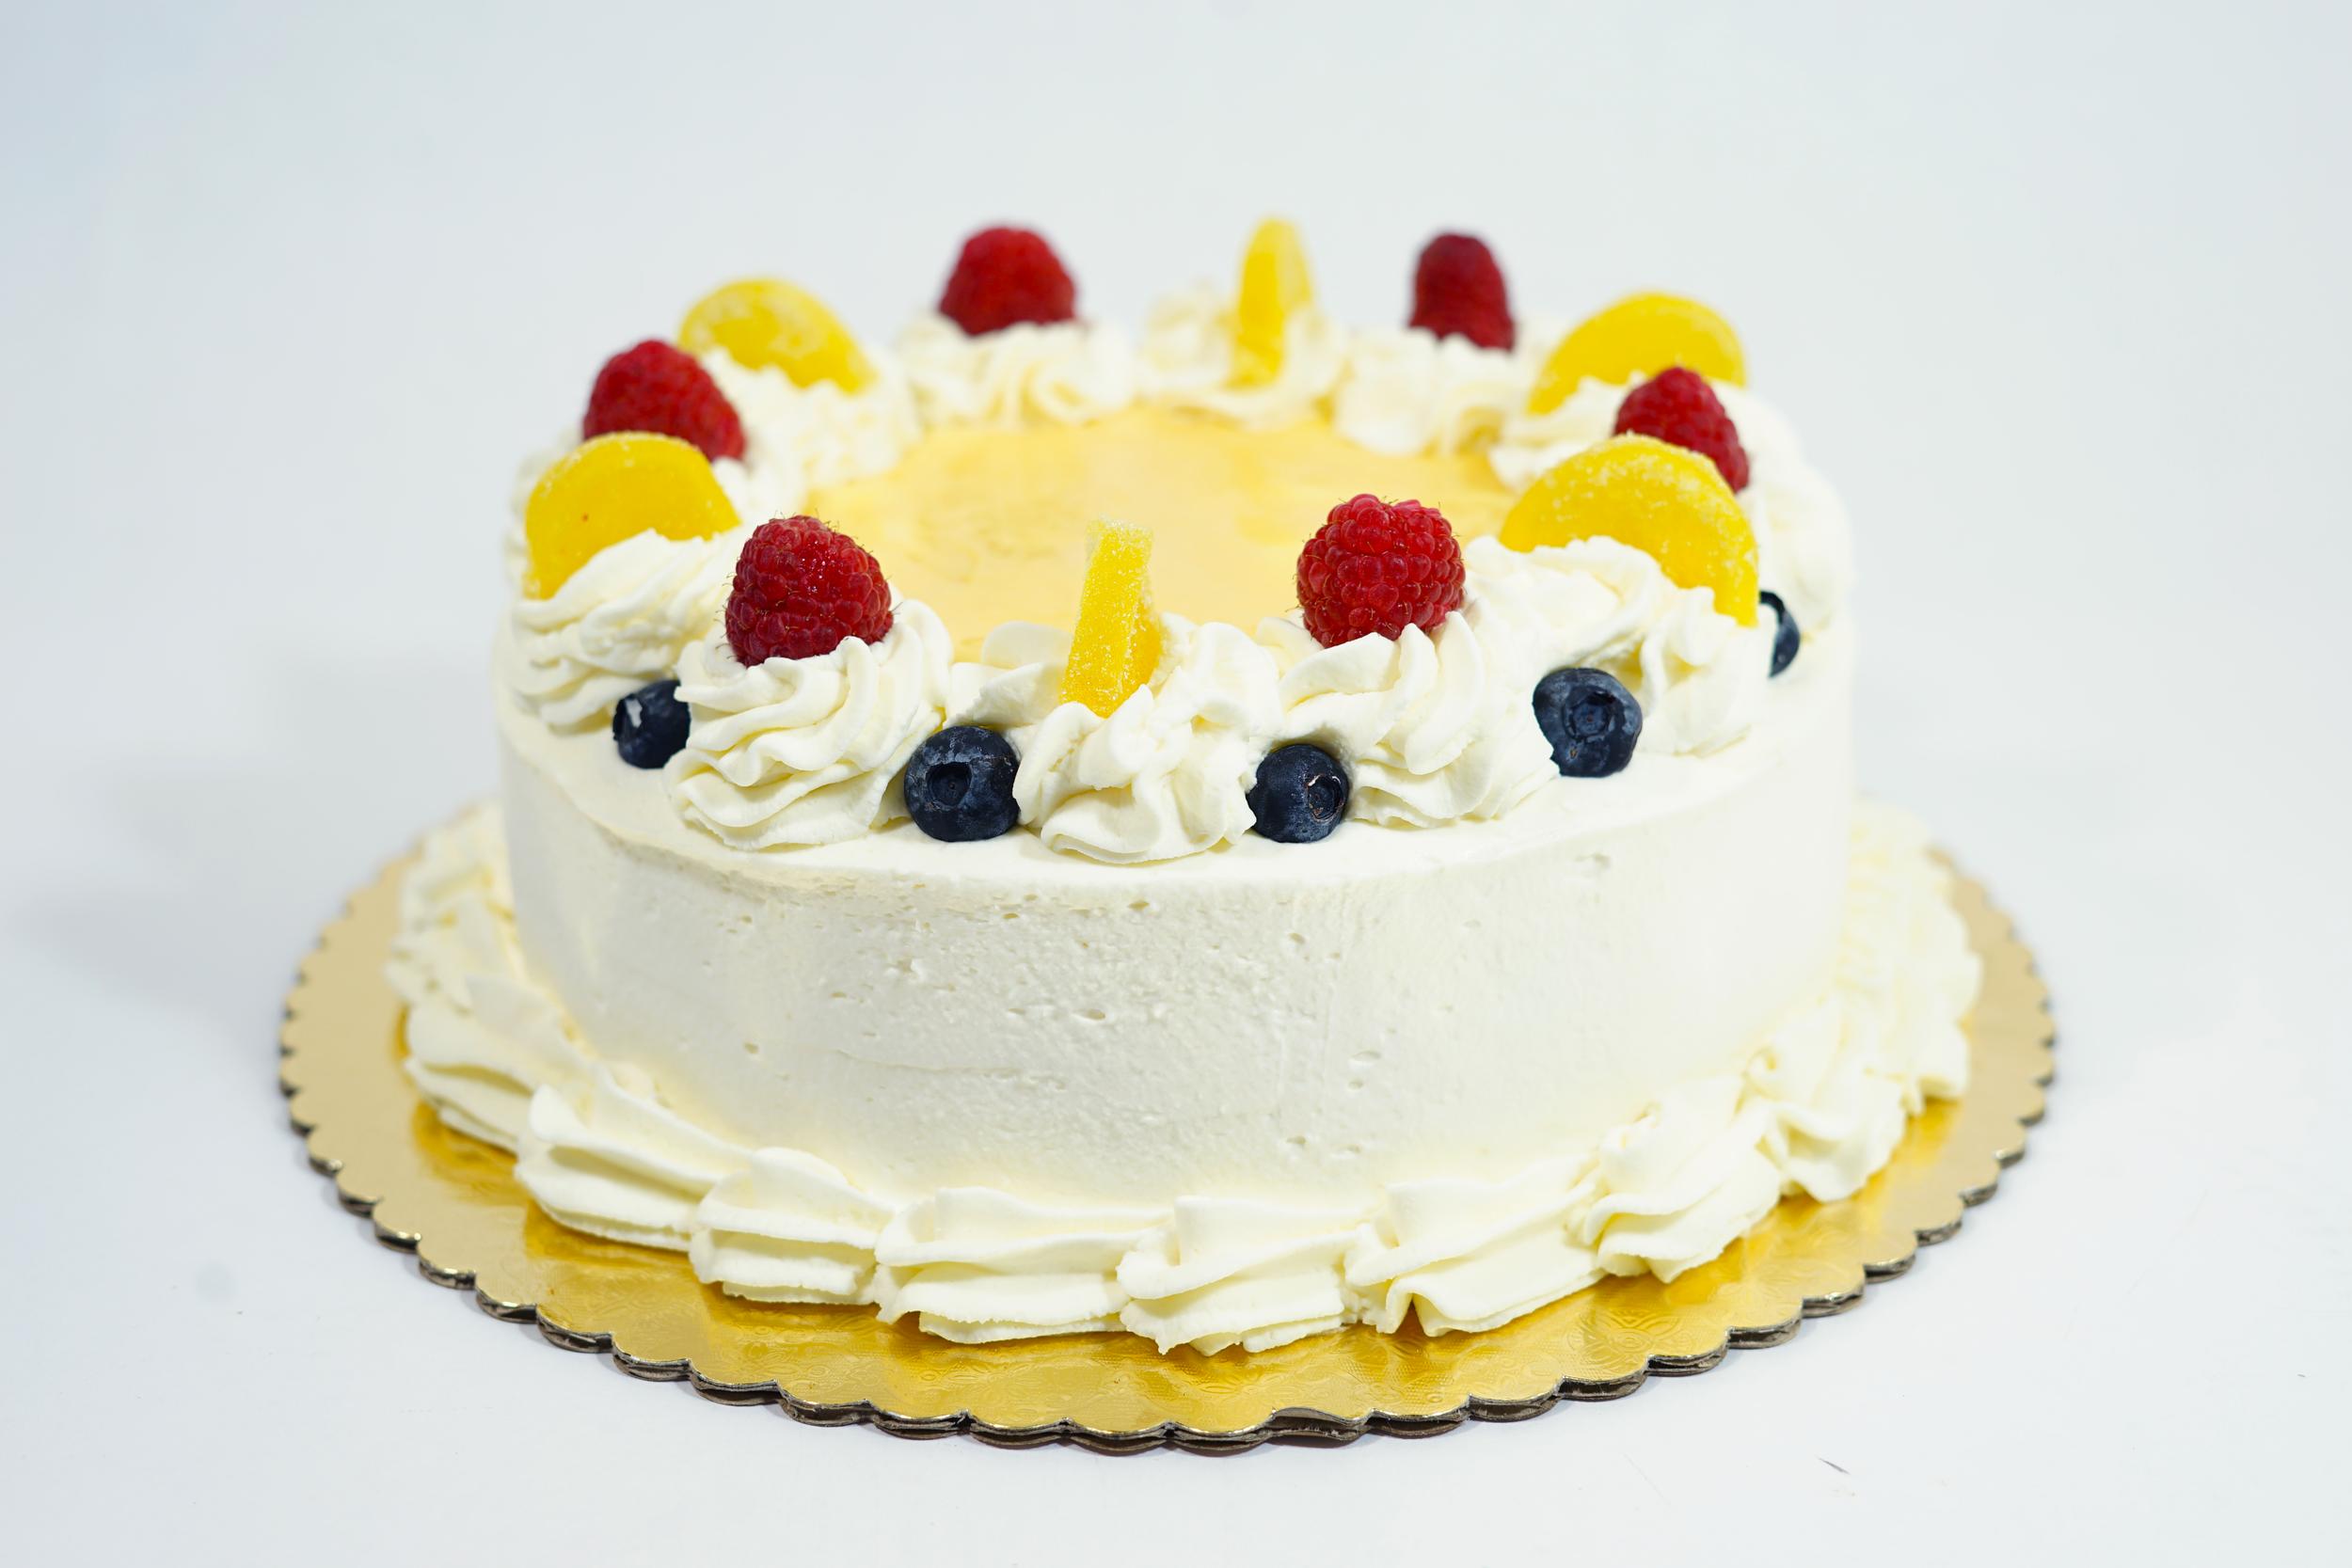 Lemon Seville - A white cake spritzed with lemon syrup and filled with lemon curd. Iced with a lemon mousse.